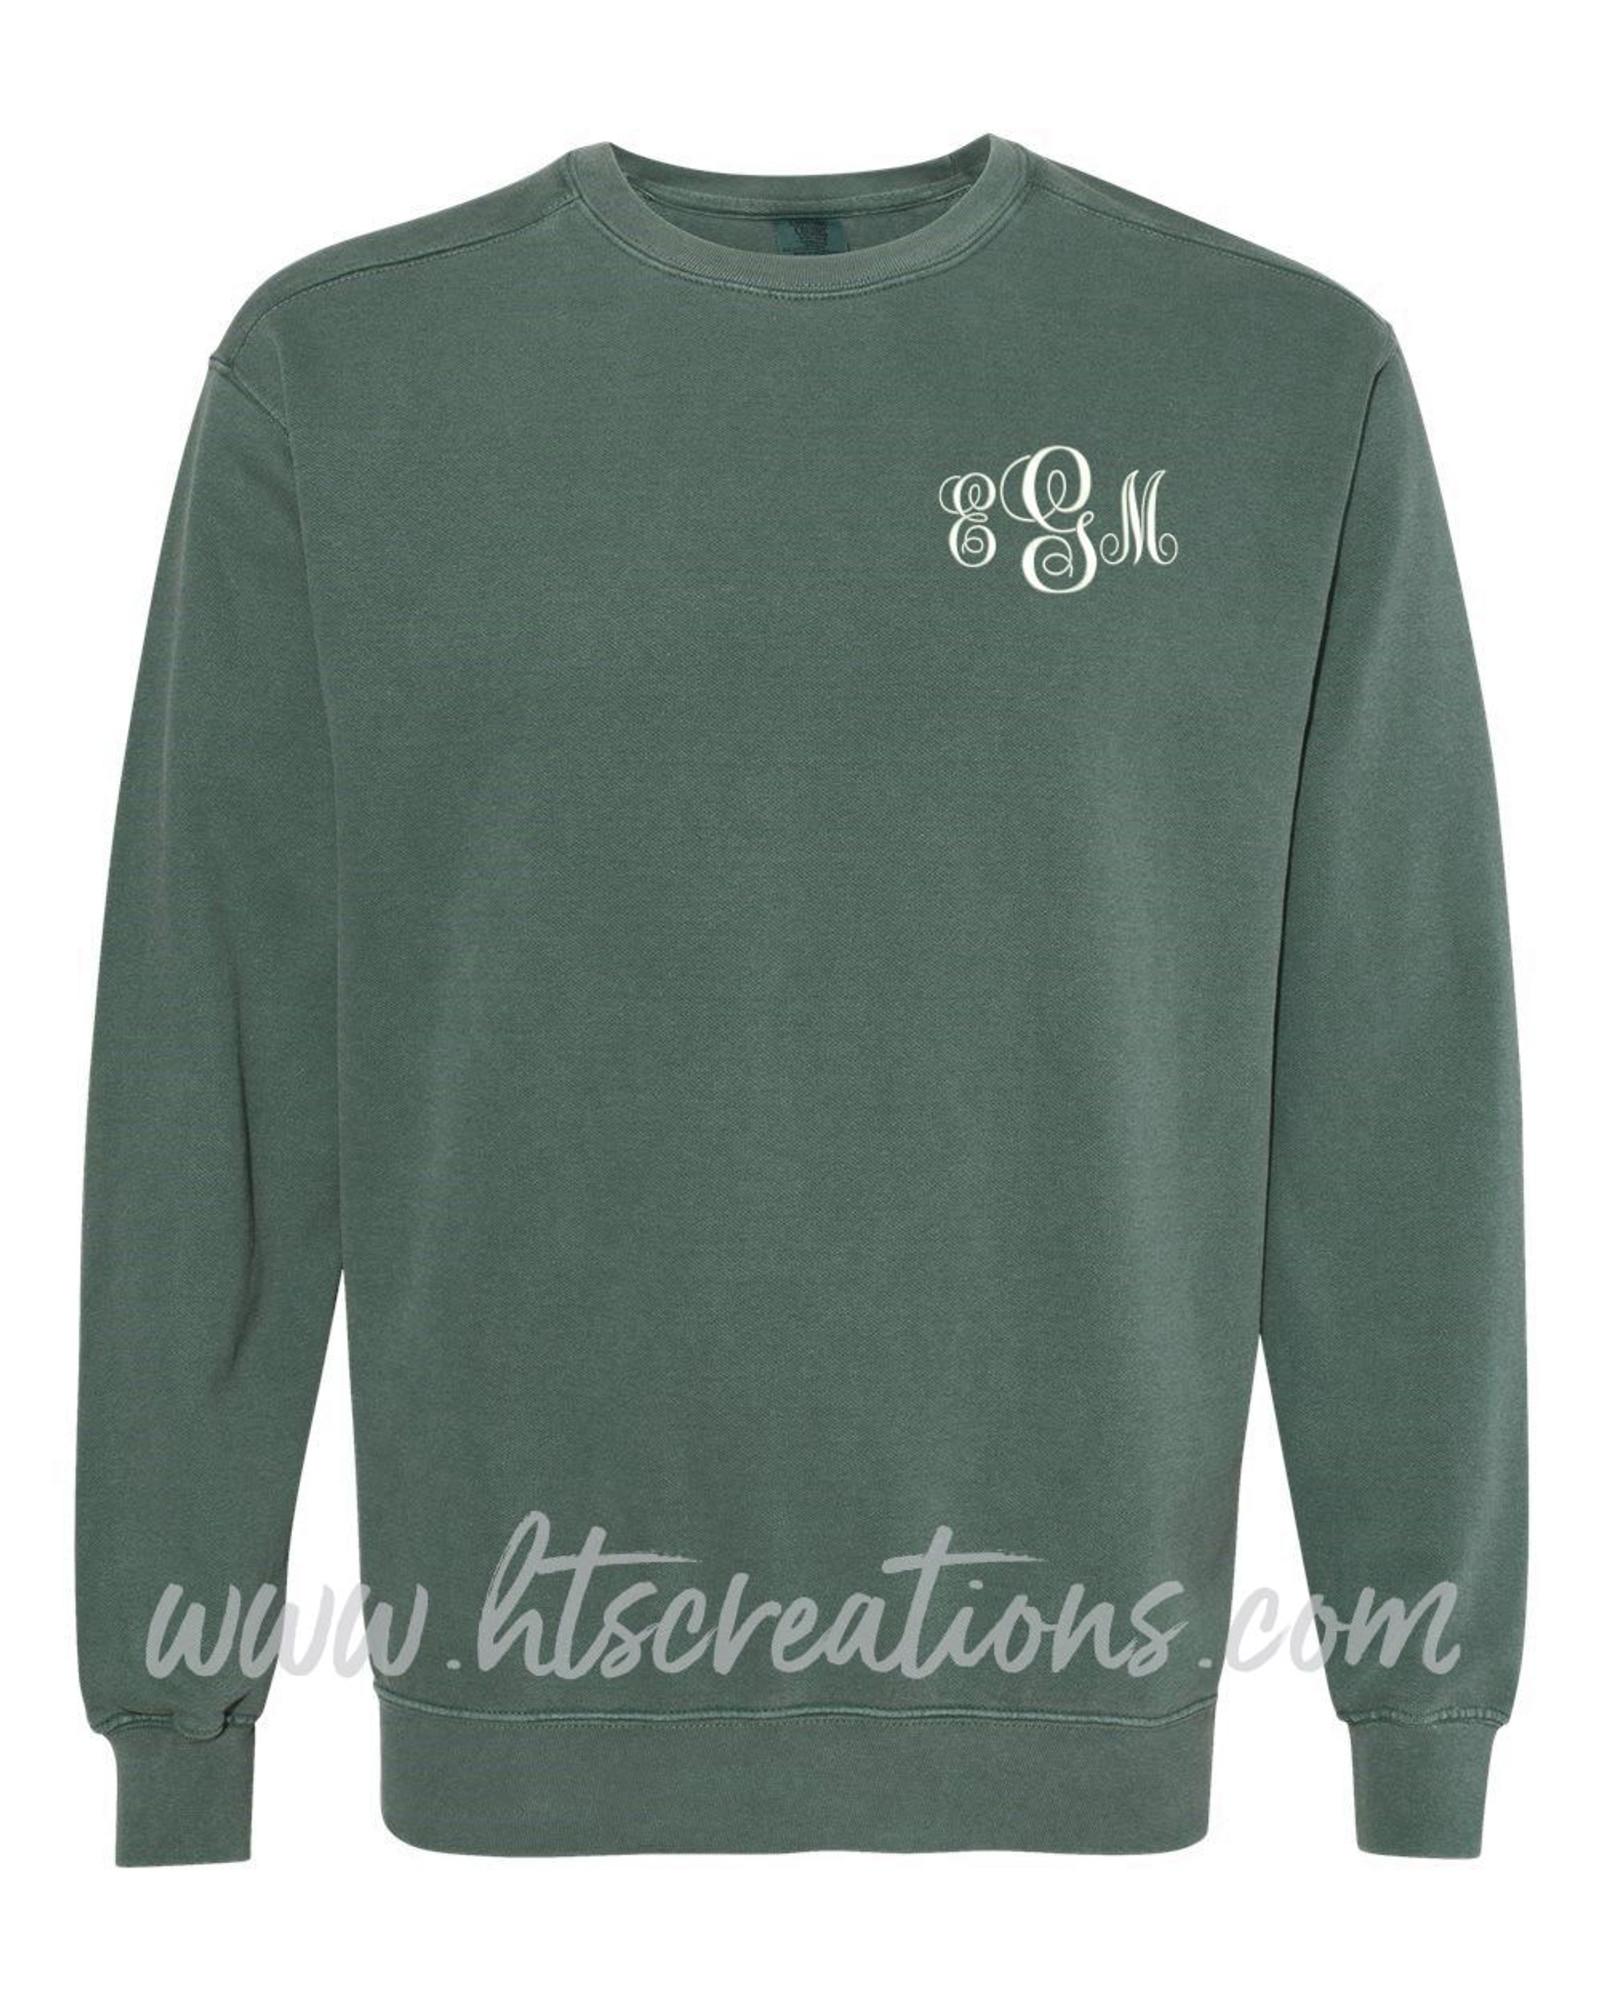 Pick your Fabric Custom Plus Sizes- Monogrammed Applique Comfort Colors Crew Neck Sweatshirt Unisex